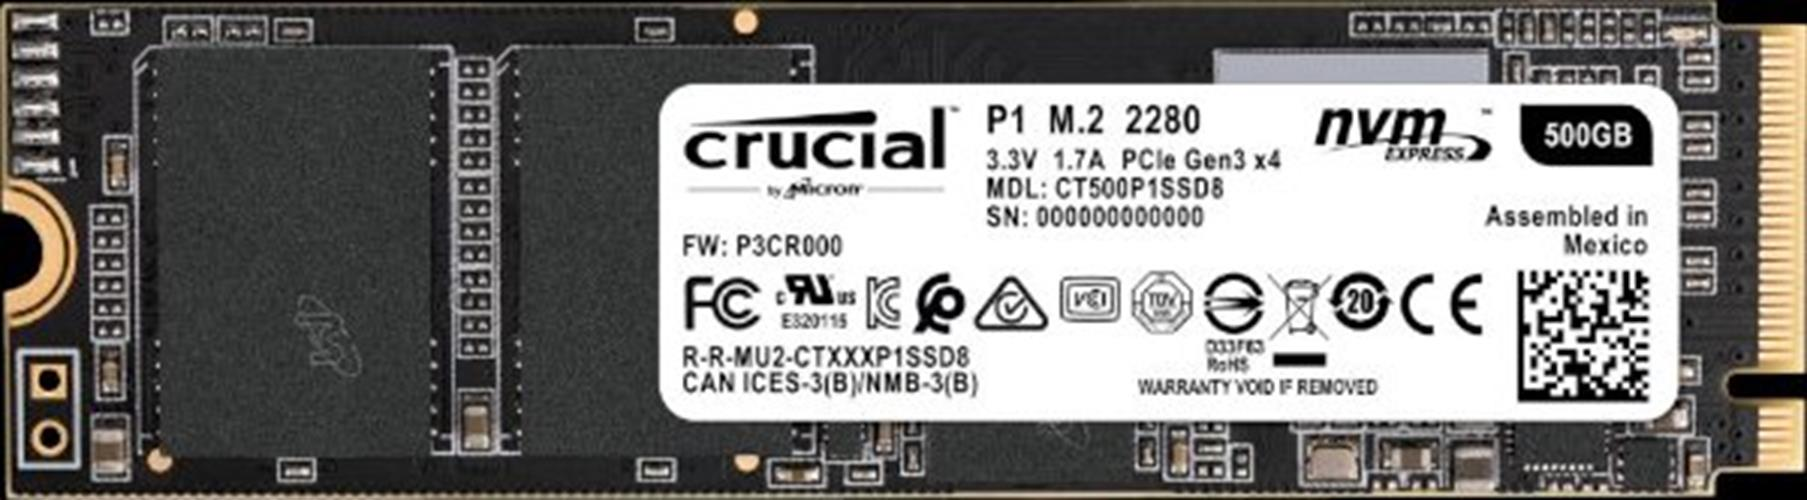 דיסק CRUCIAL SSD CT500P1SSD8 500GB M.2 NVMe